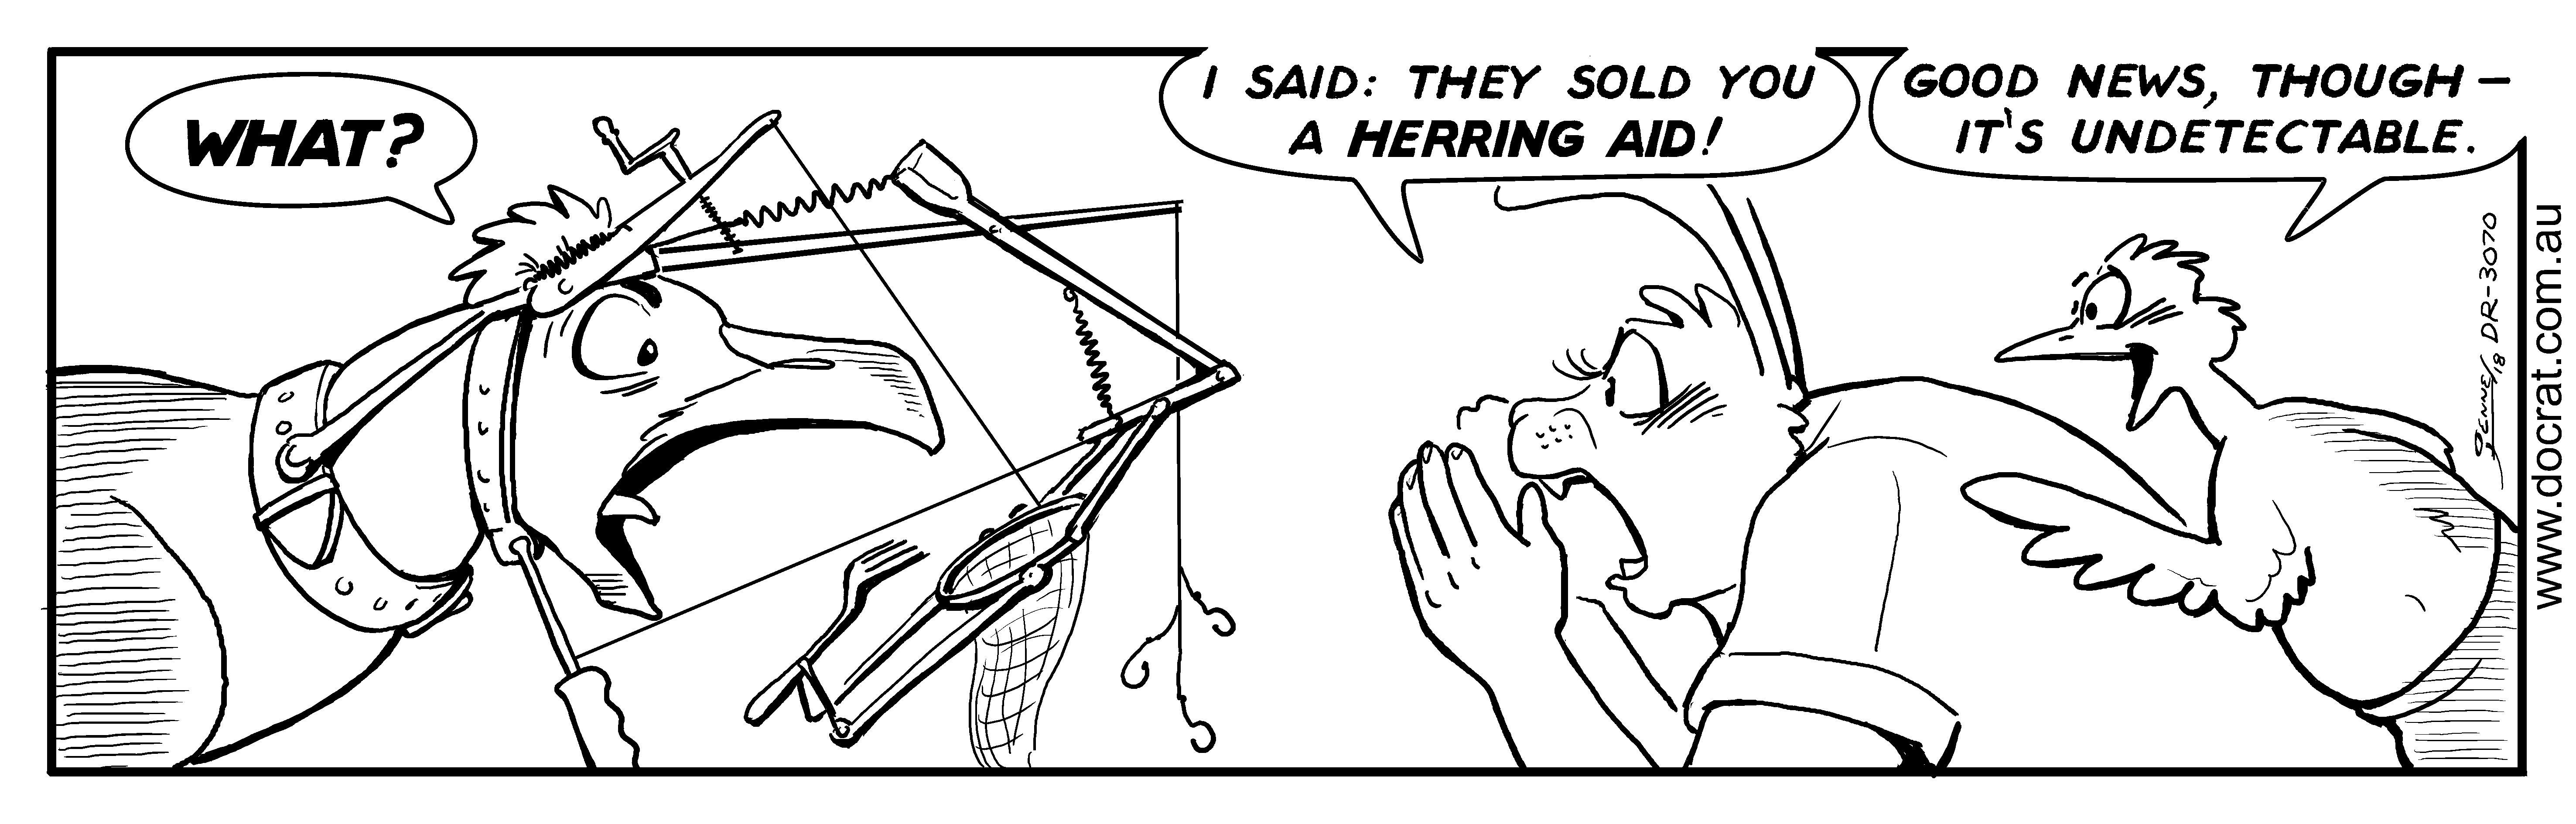 20180720